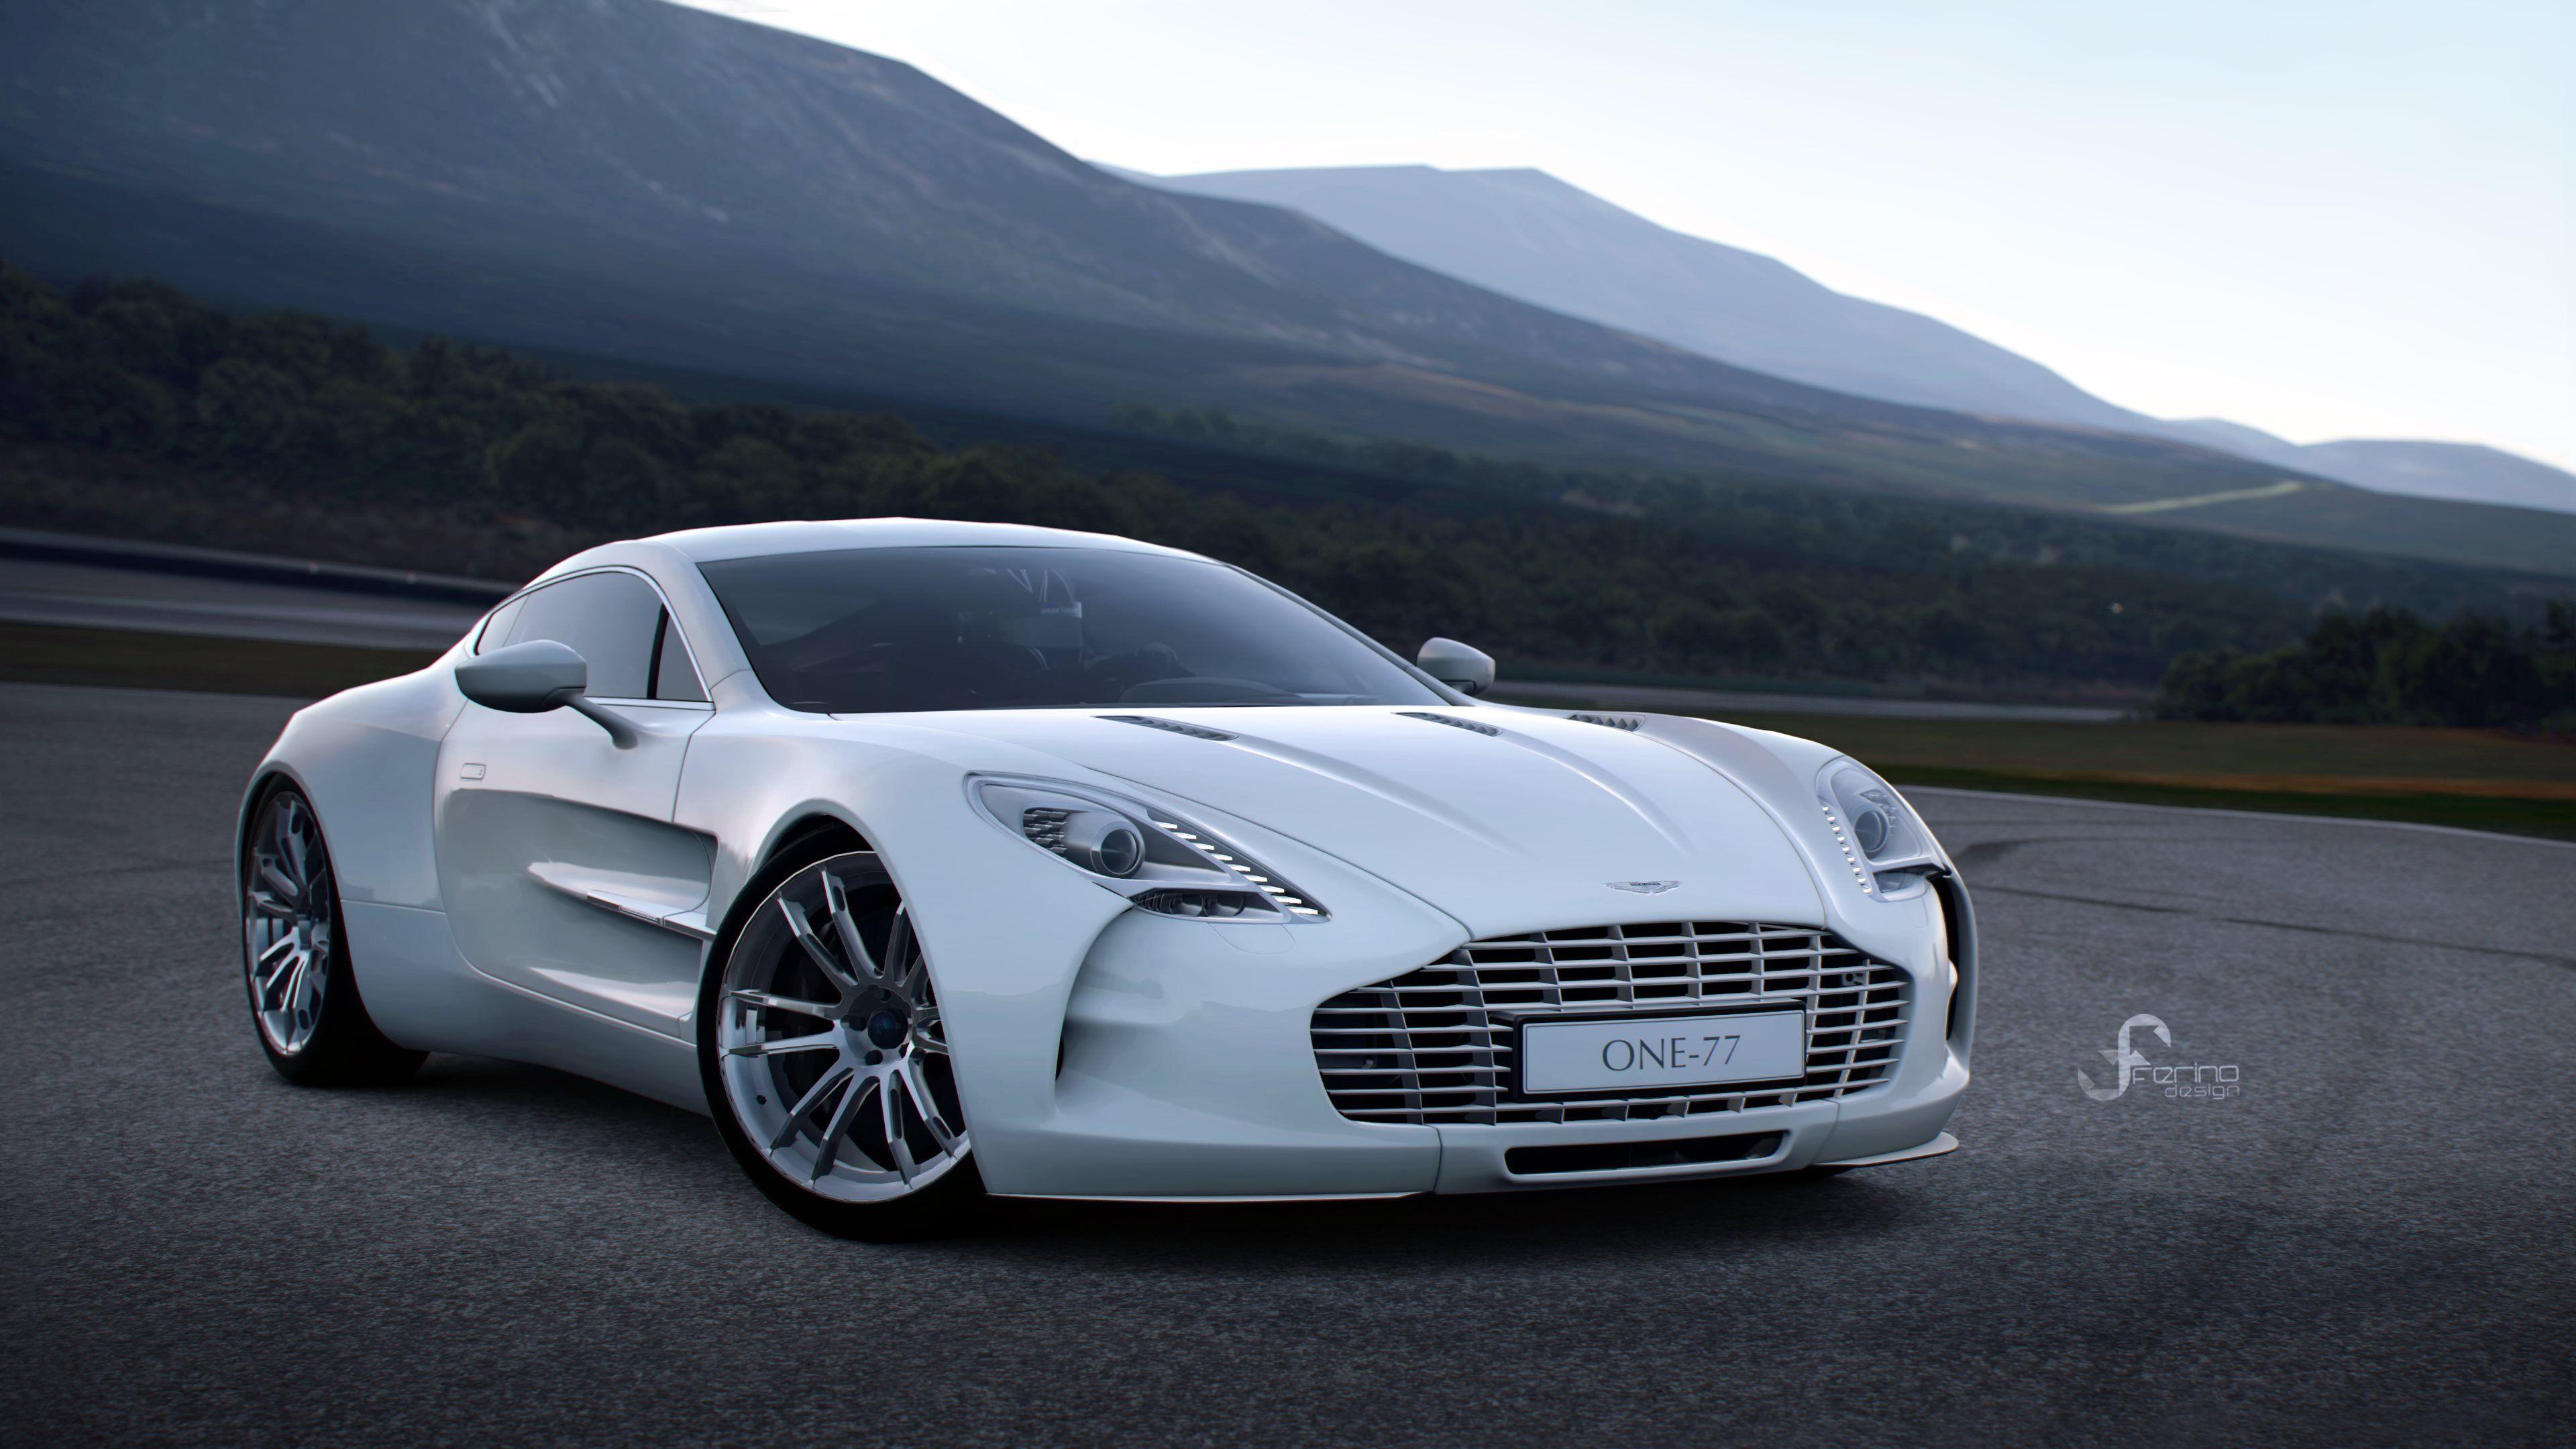 aston martin one 77 wallpaper for iphone #vzq | cars | pinterest